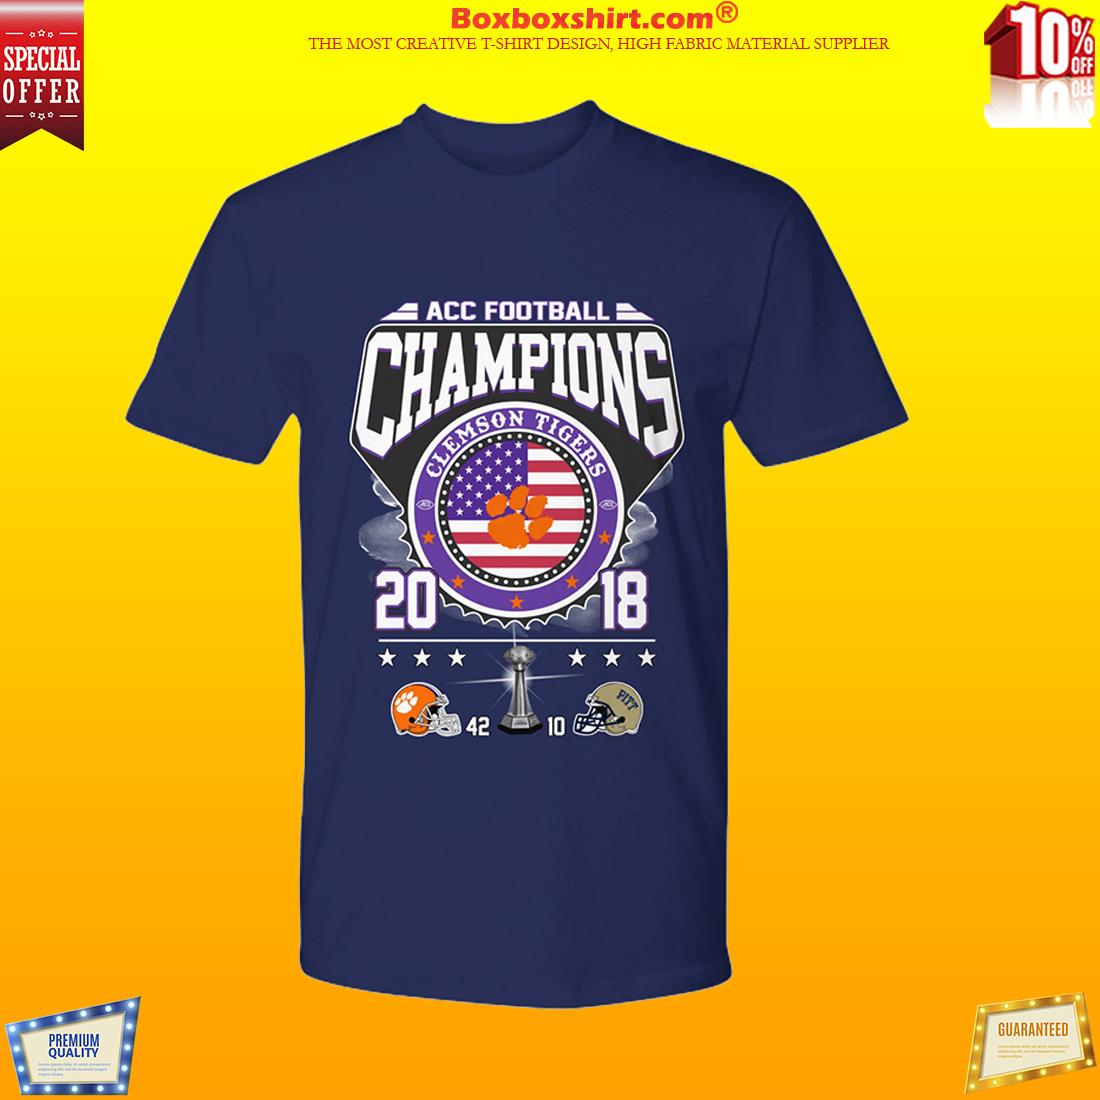 ACC football champion Clemson tigers shirt